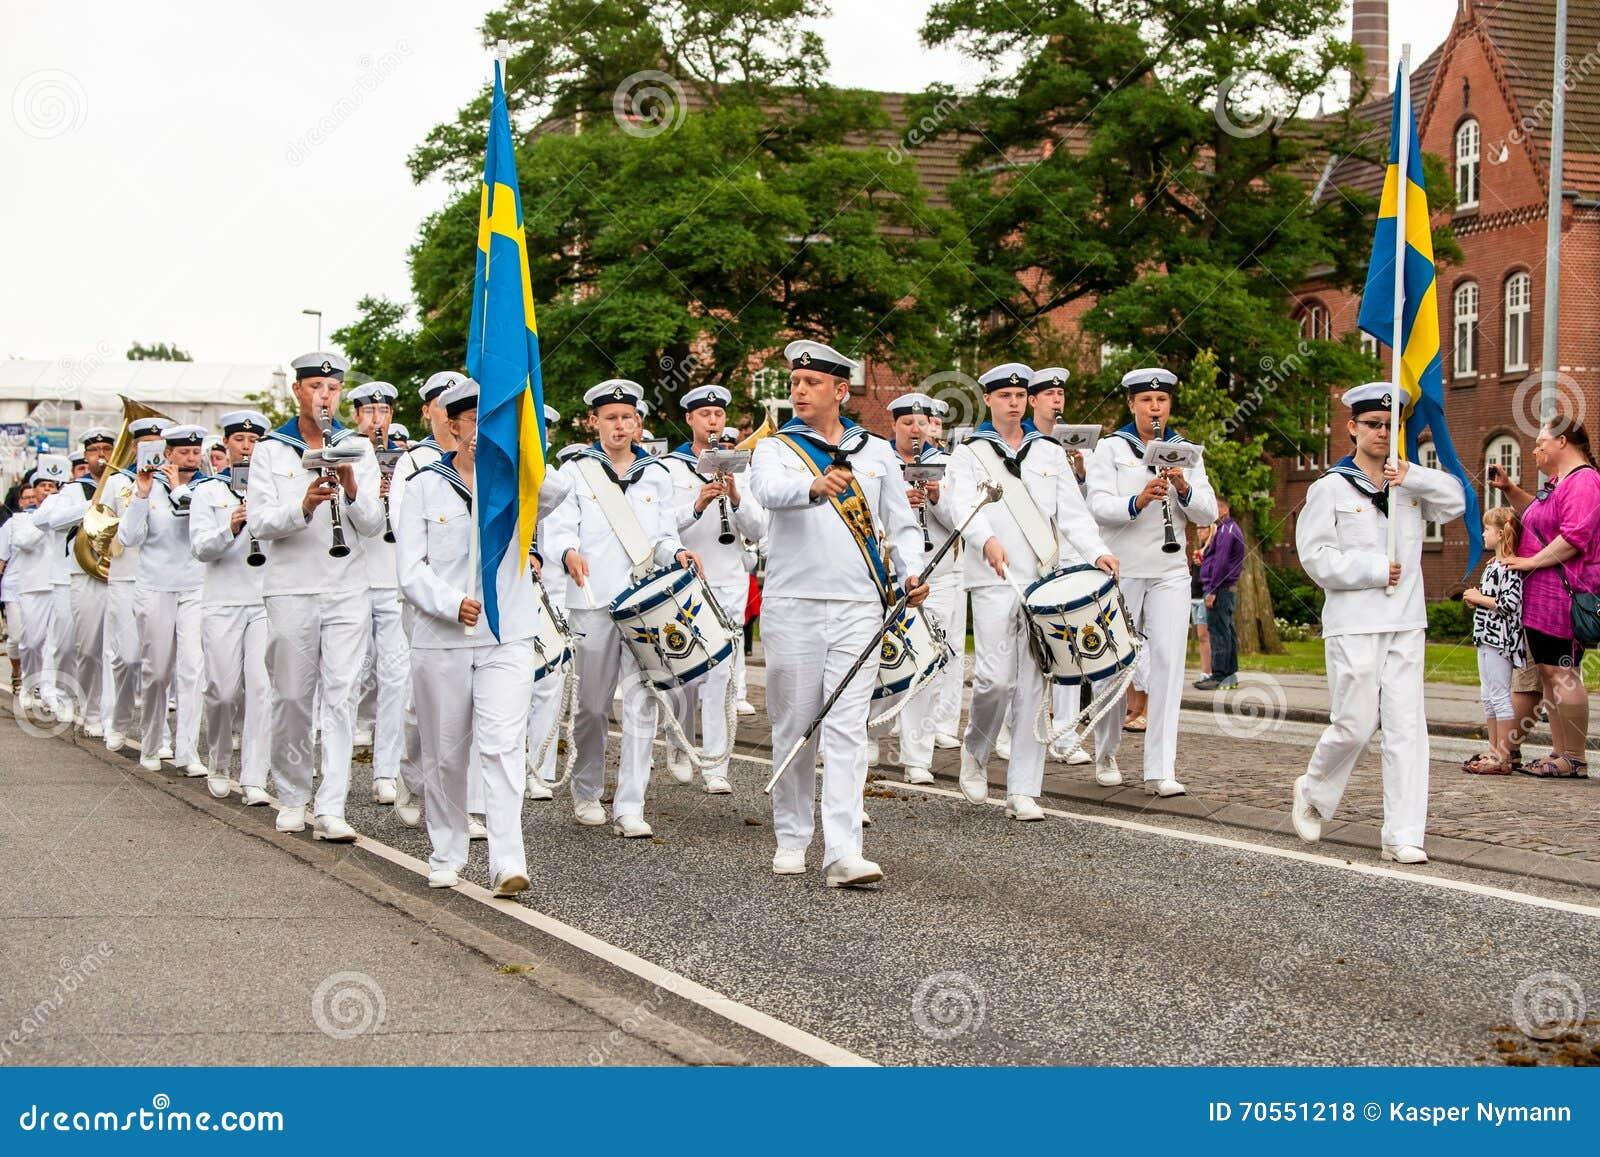 AABENRAA, DÄNEMARK - 6. JULI - 2014: Schwedisches tambour Korps an einem PA